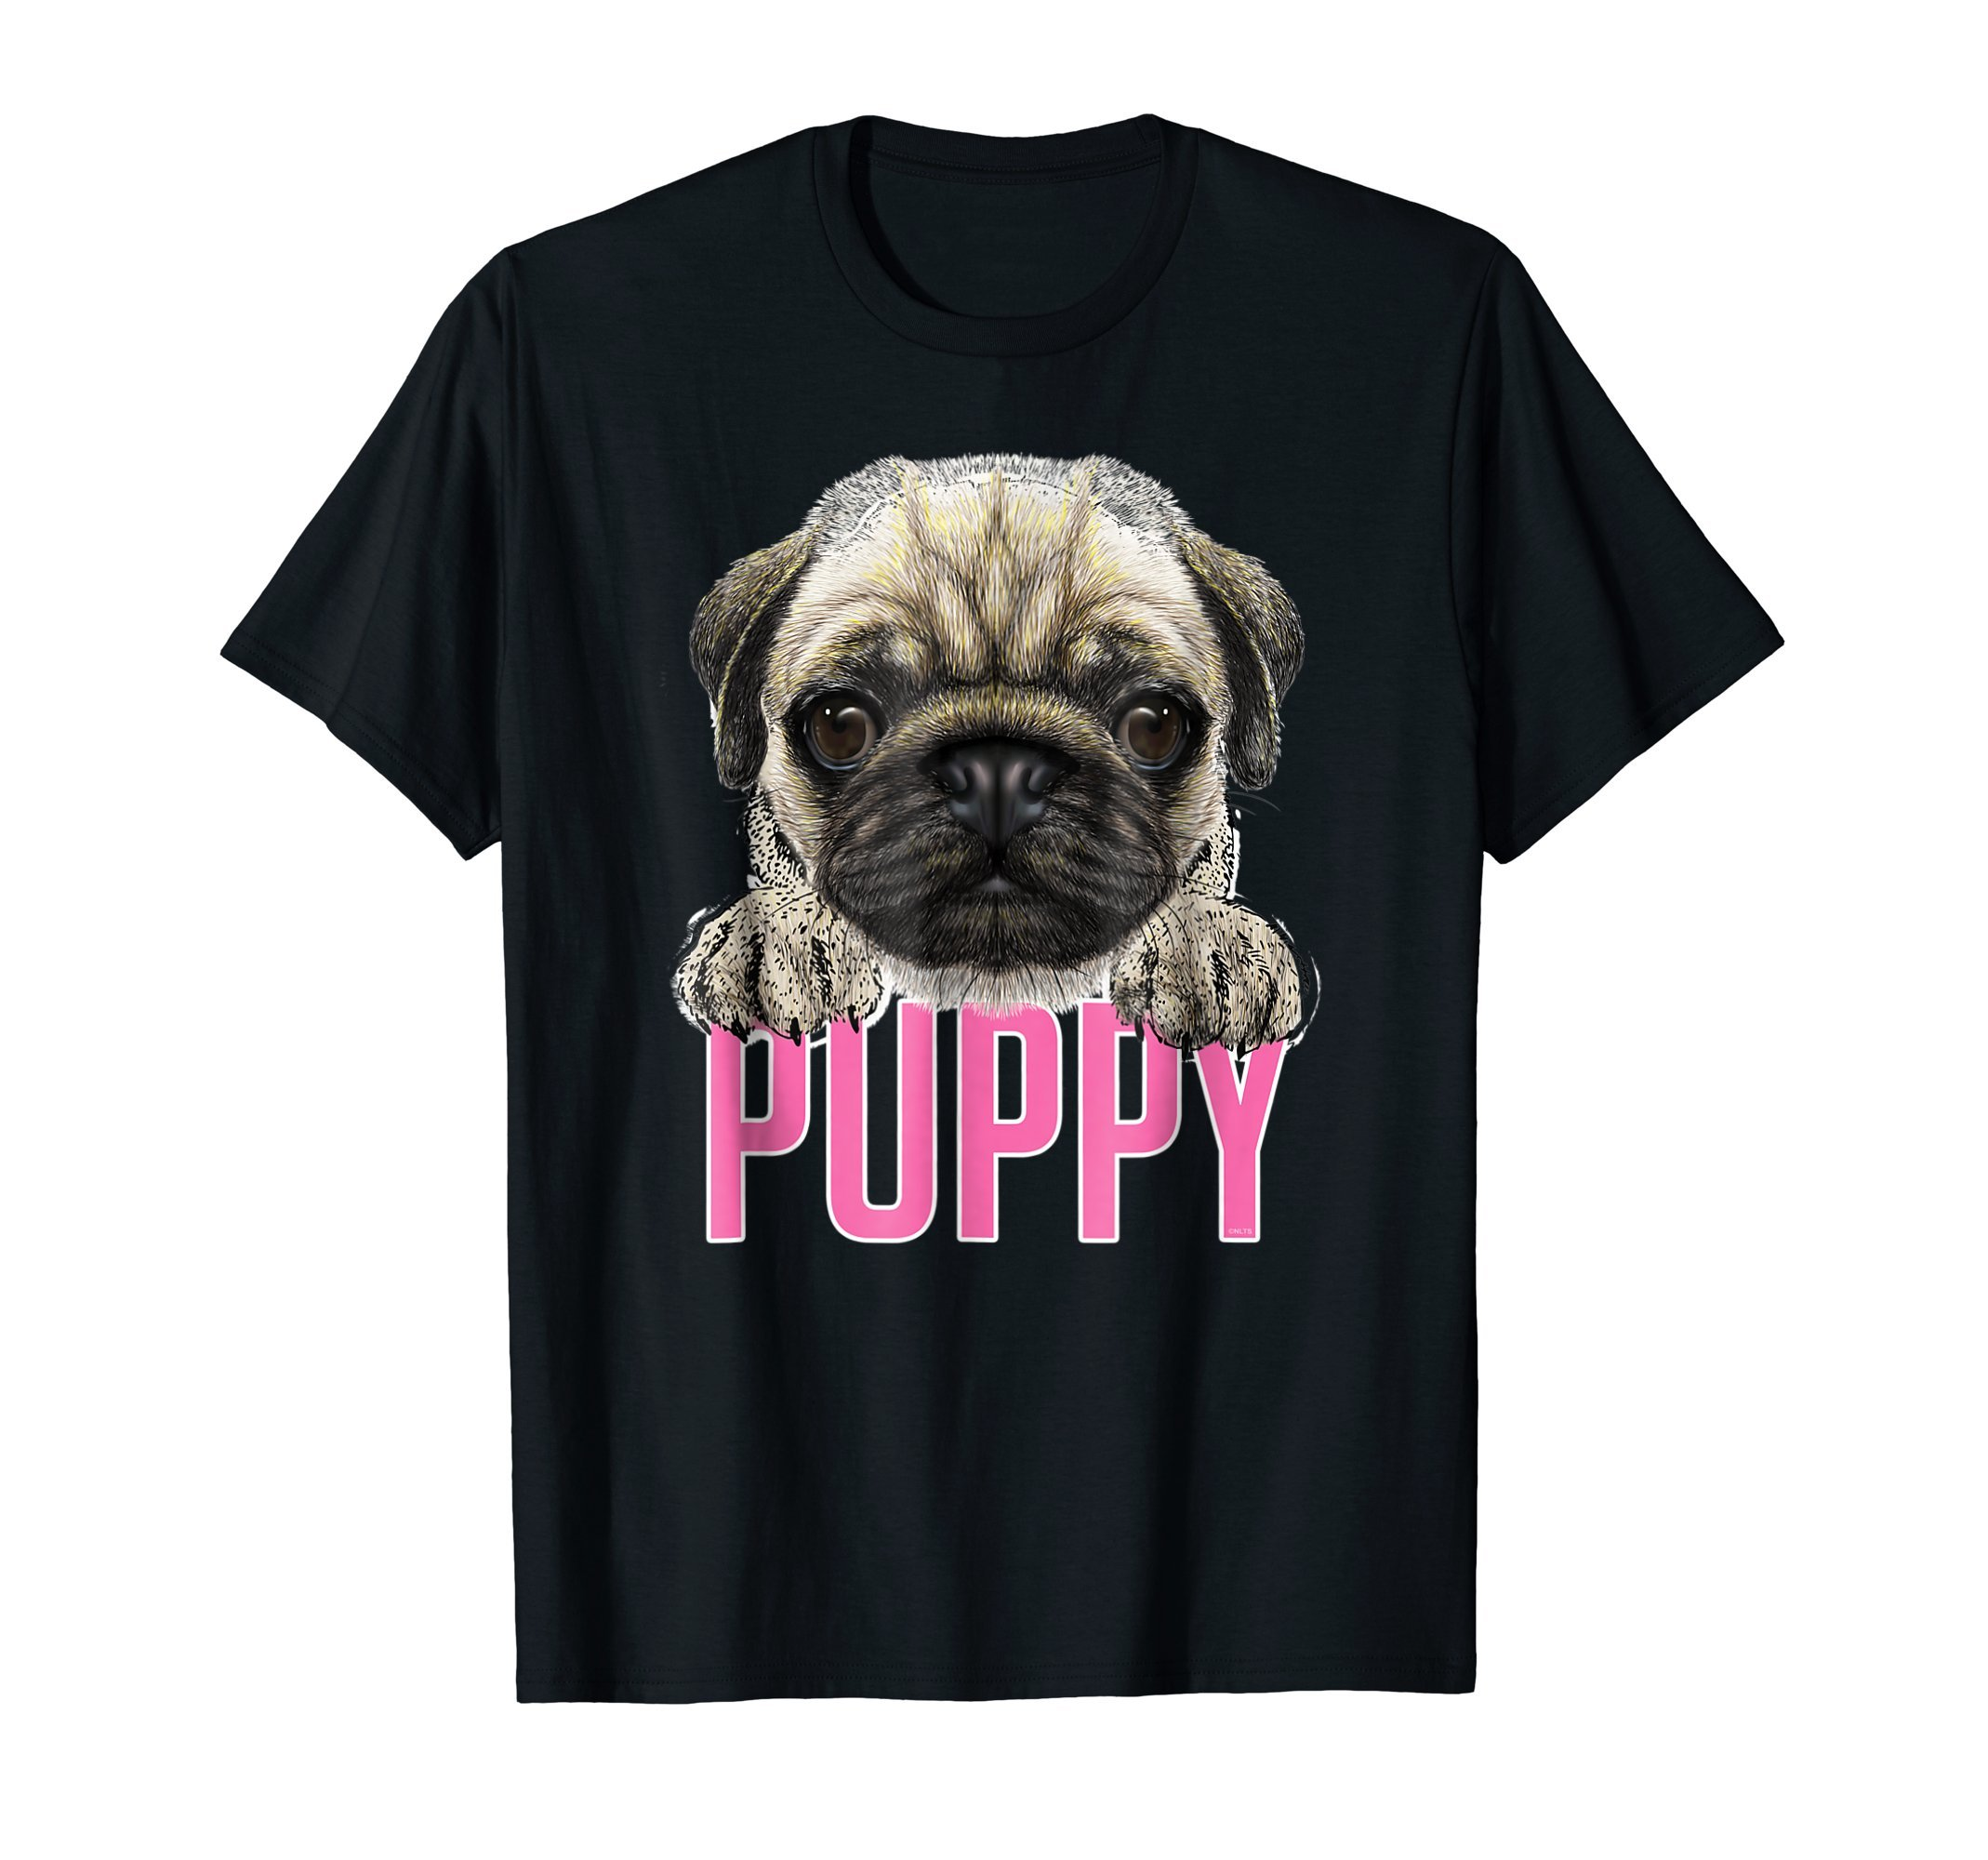 Pug-Puppy-Girl-Funny-Humor-T-Shirt-Shirt-Tee-Gift